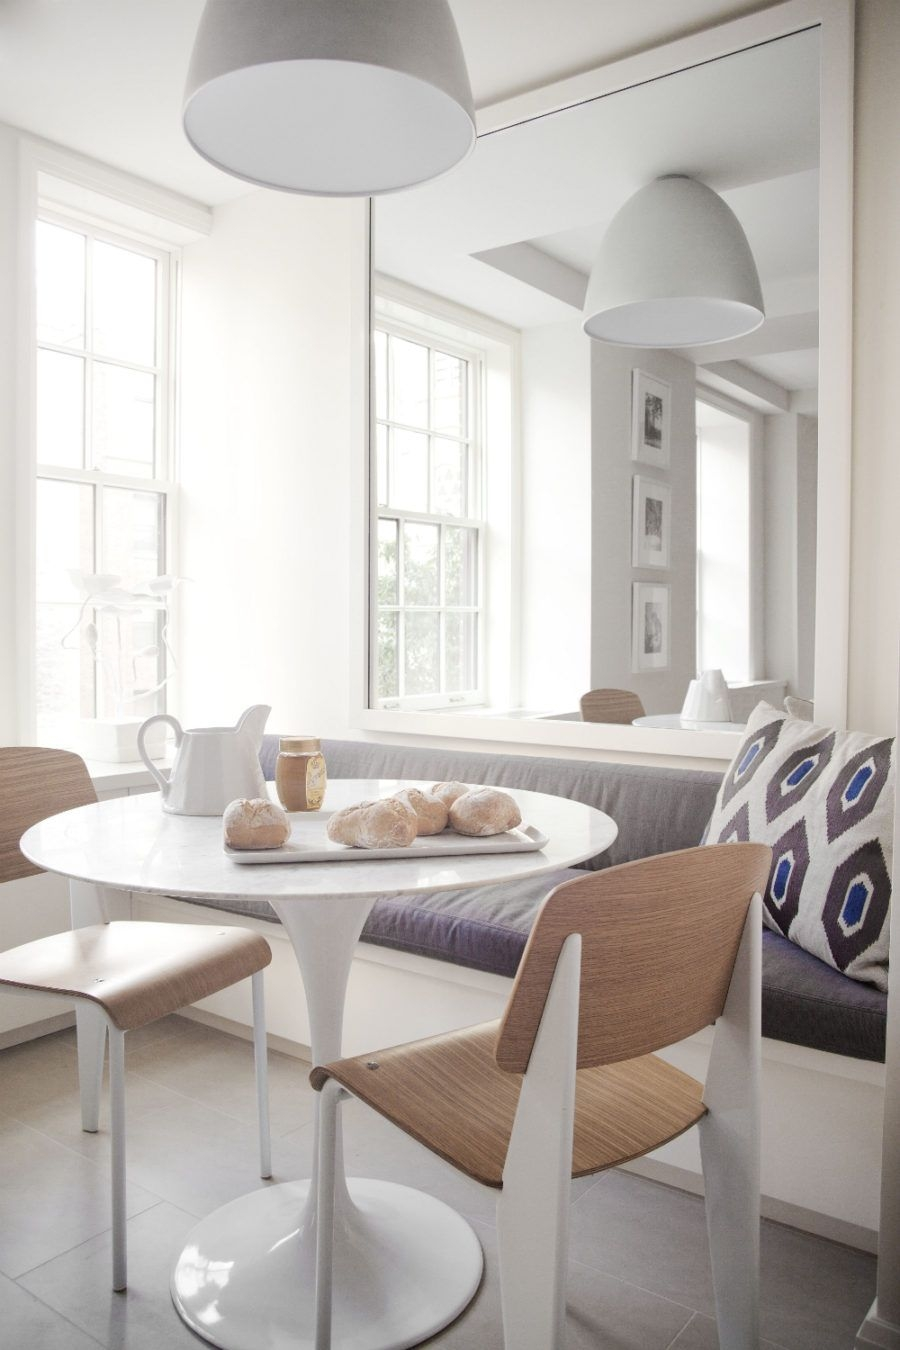 Modern Breakfast Nook